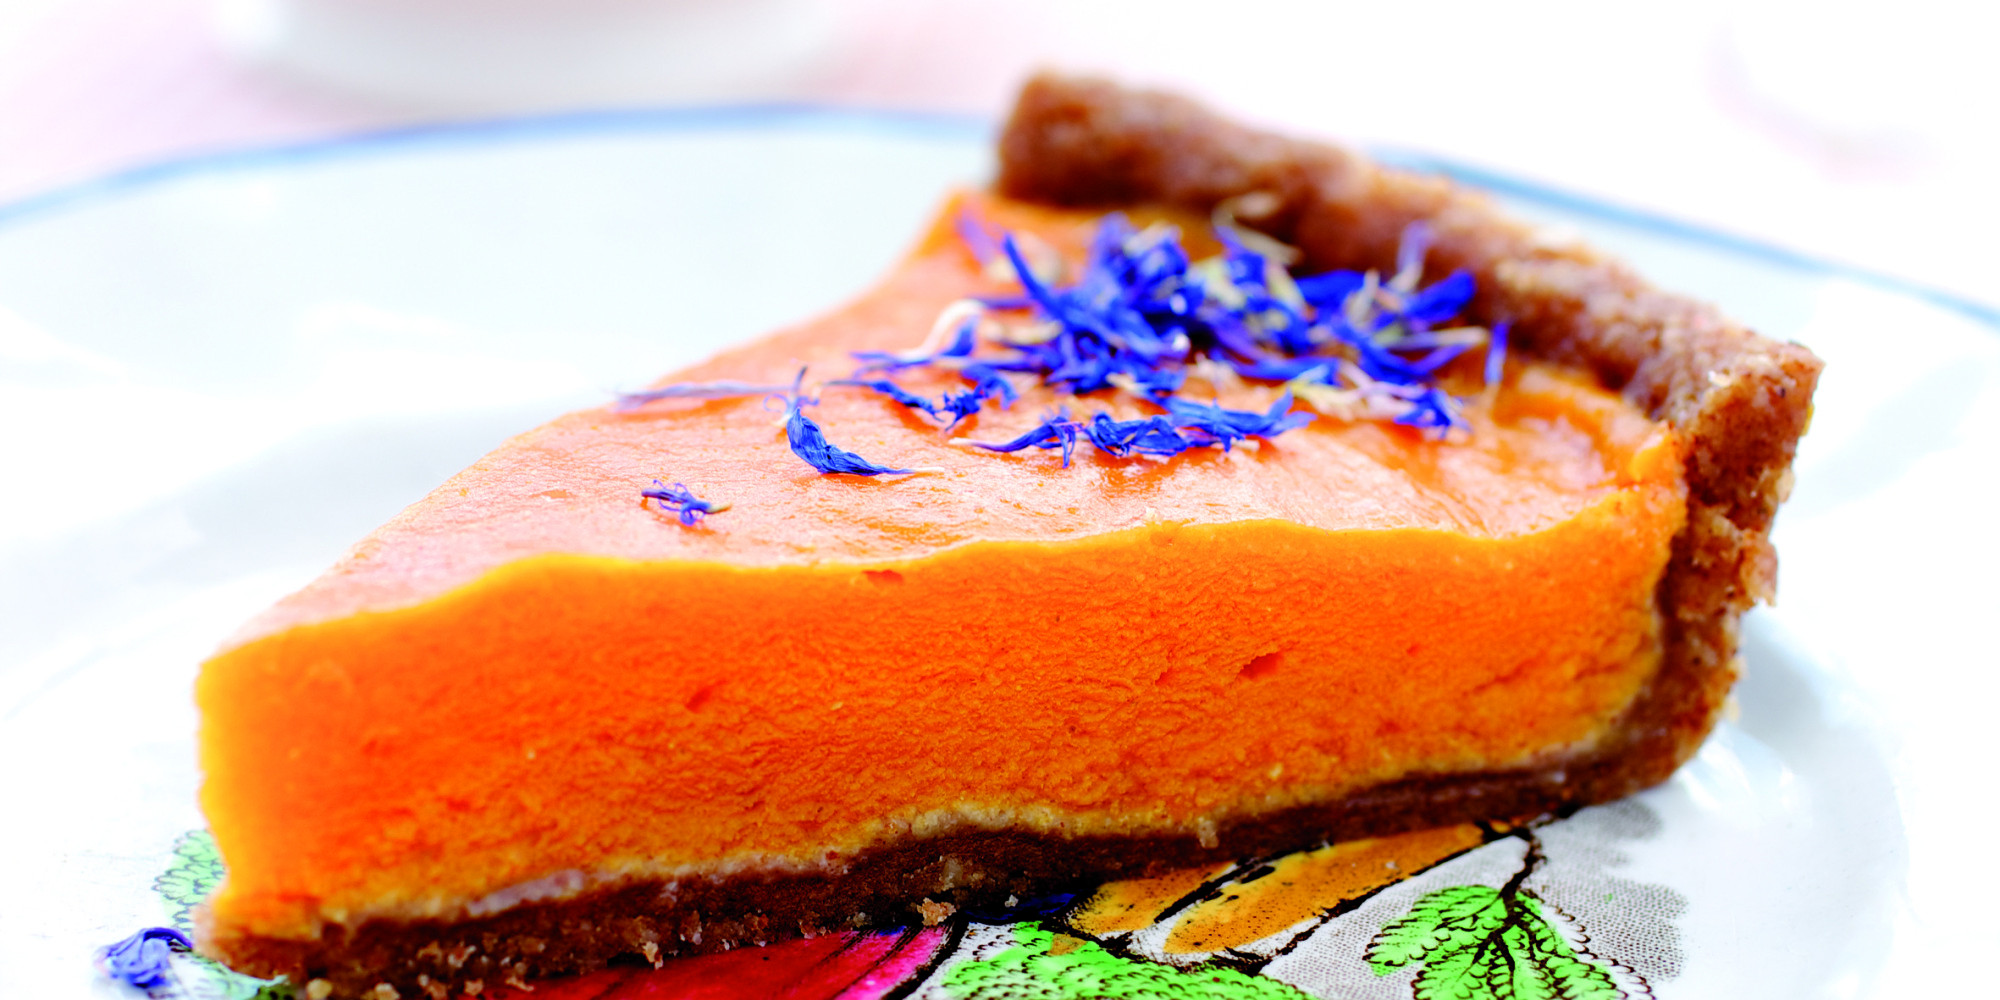 Papaya Dessert Recipe  Raw Cake Recipes Papaya Pie Ginger Cookie And